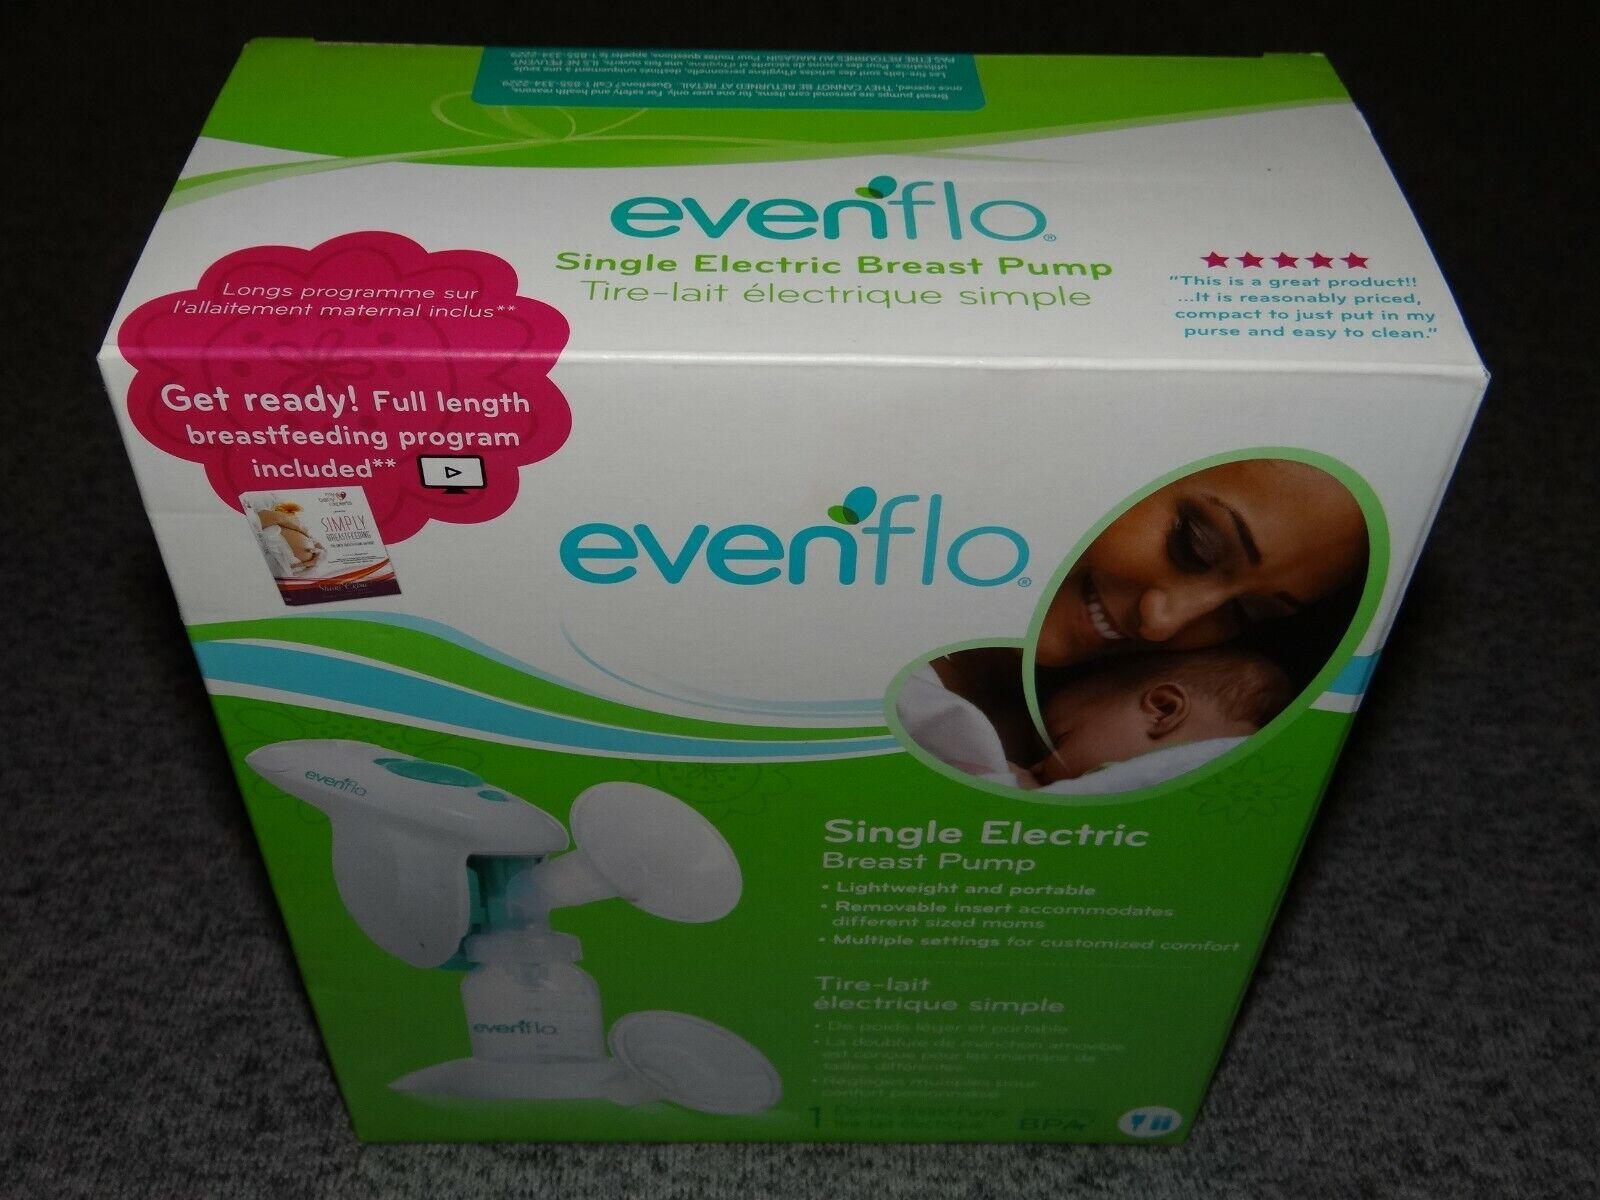 Evenflo Single Lightweight Portable Electric Breast Pump 2900 BPA Free SEALED - $25.99